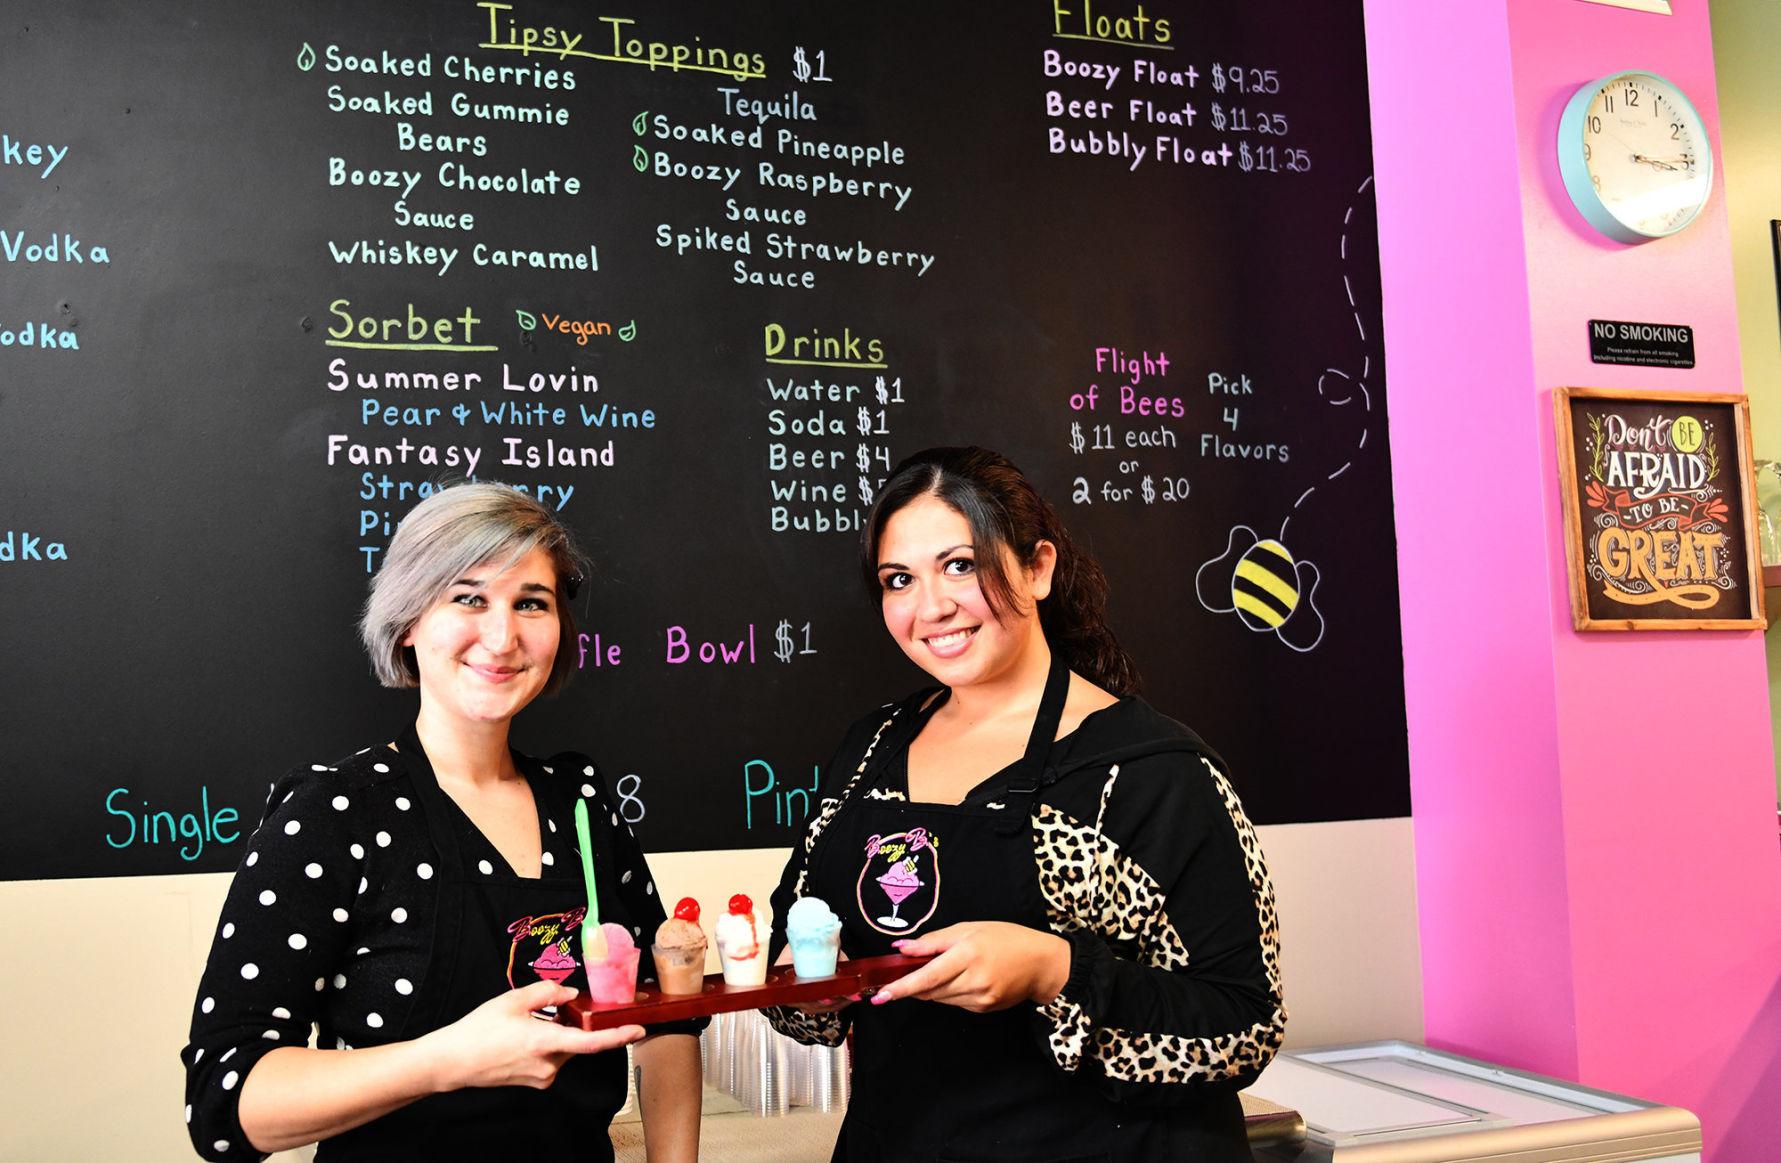 alcohol infused ice cream boozy b cover image munchpak